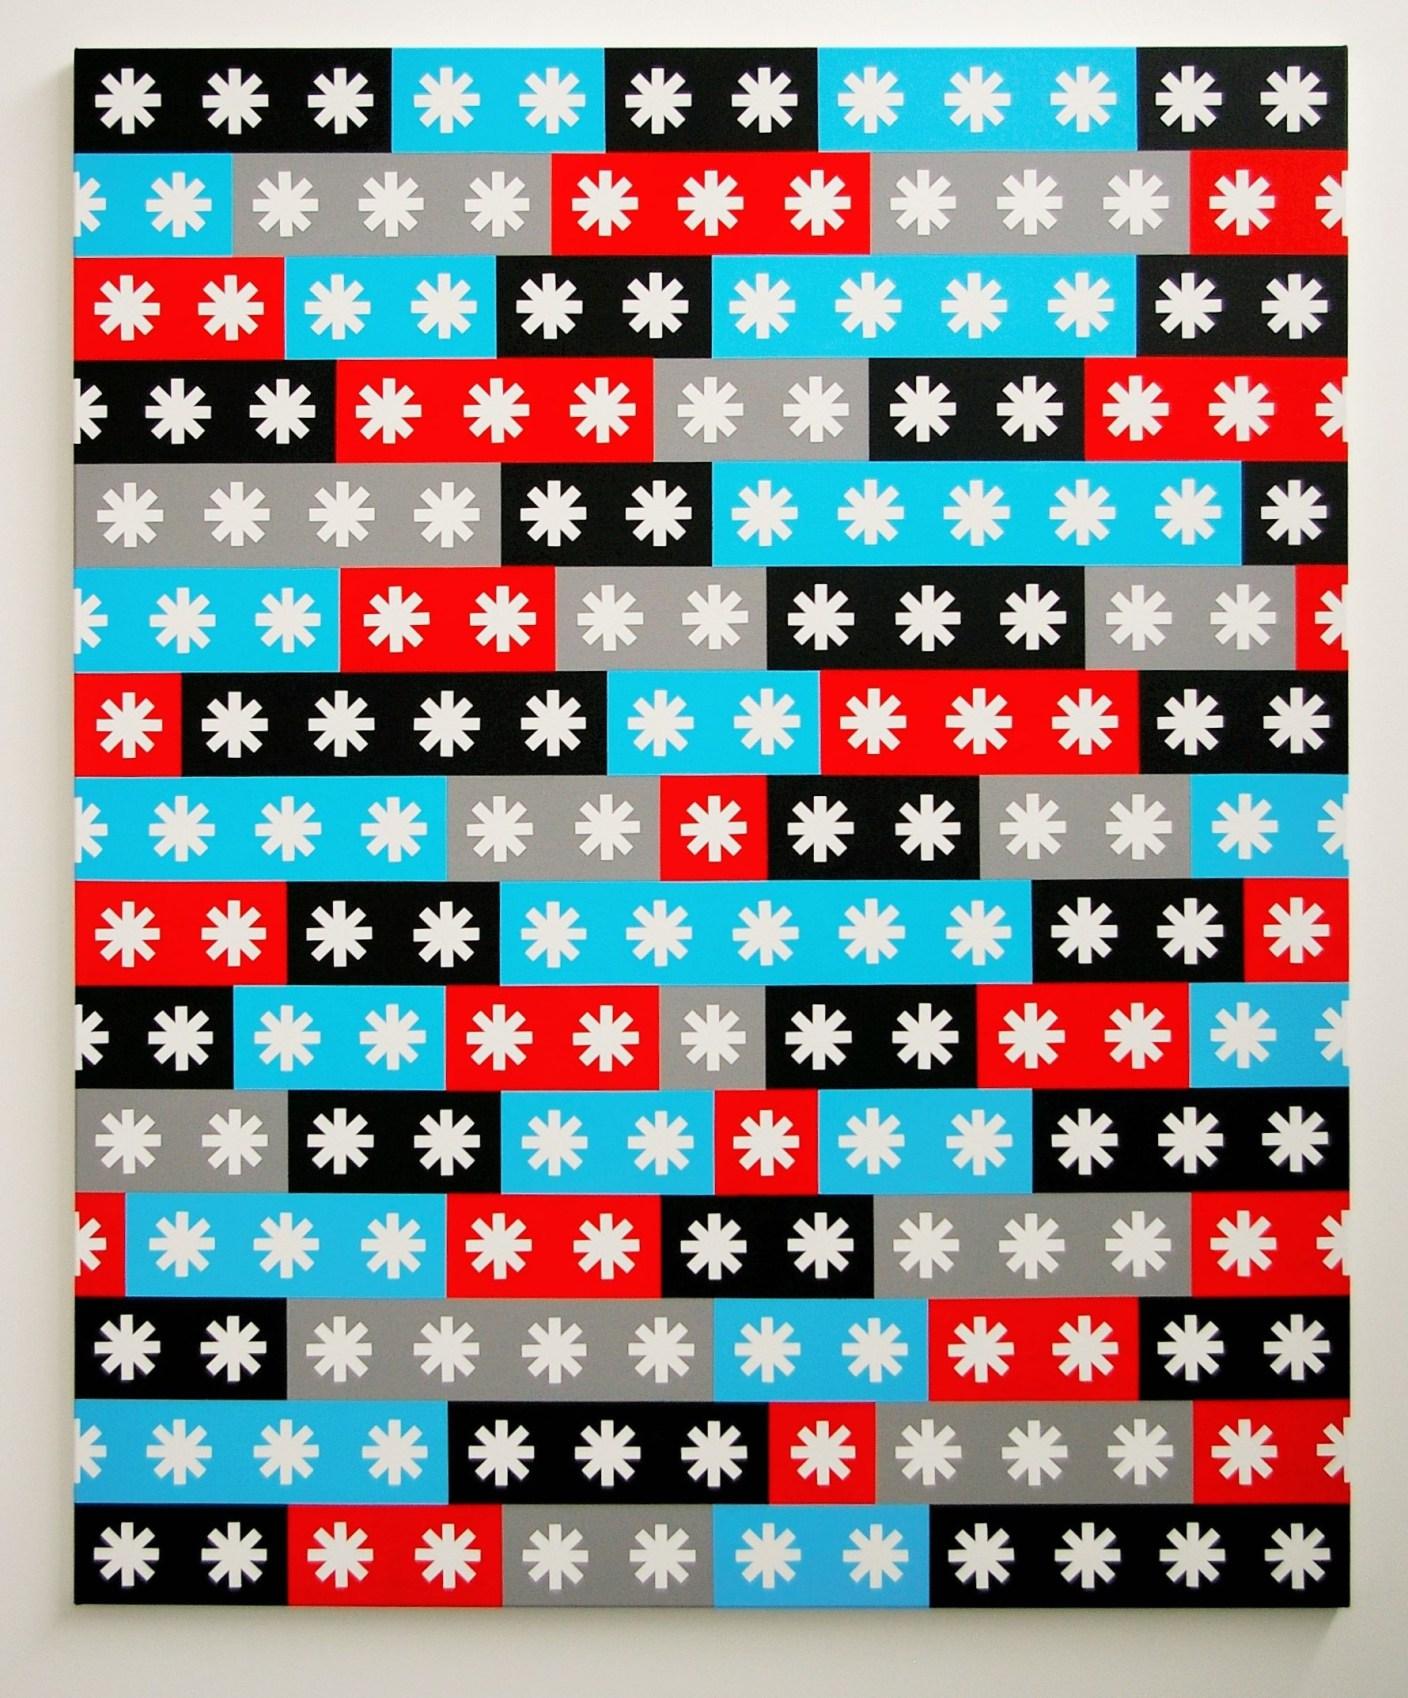 Richard Kirwan, Frame of Reference, 2012, acrylic on canvas, 168 x 137 cm (photo